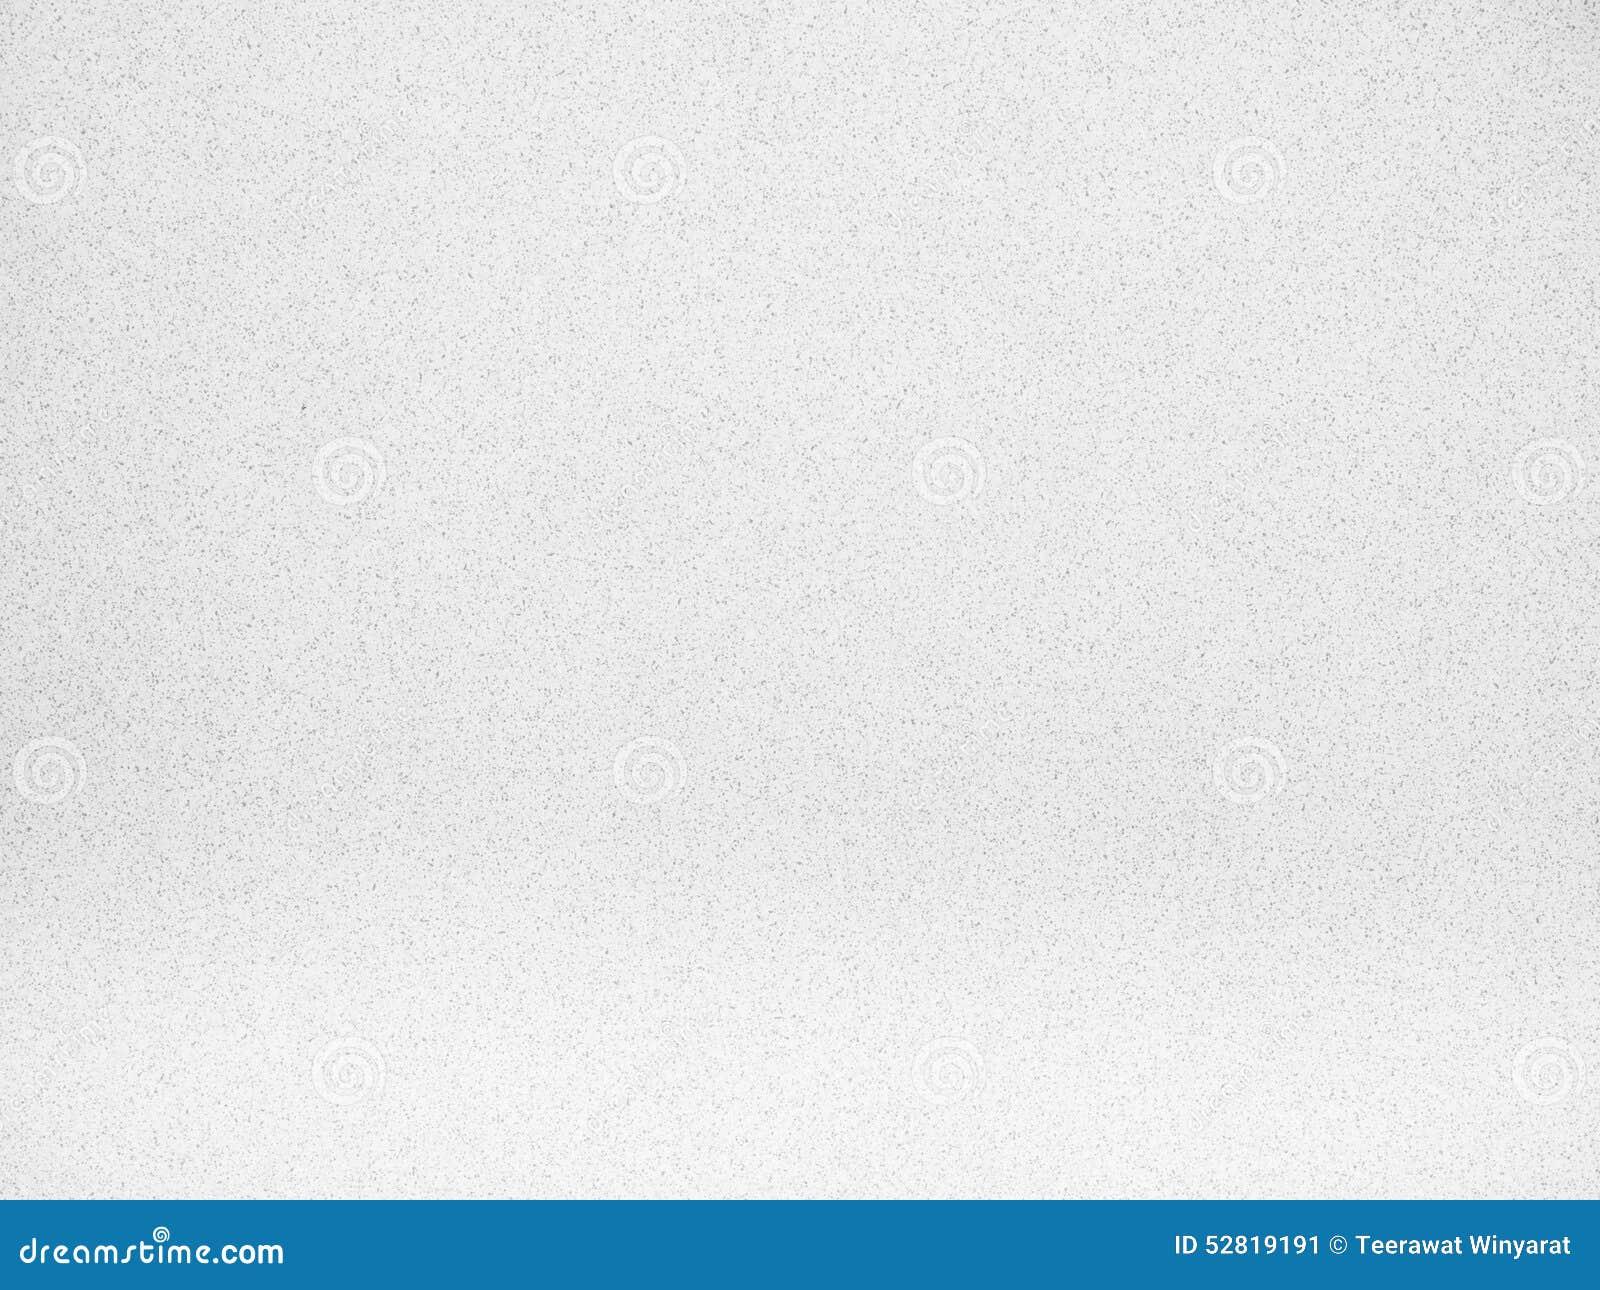 White Granite Background : White granite stone background texture stock photo image